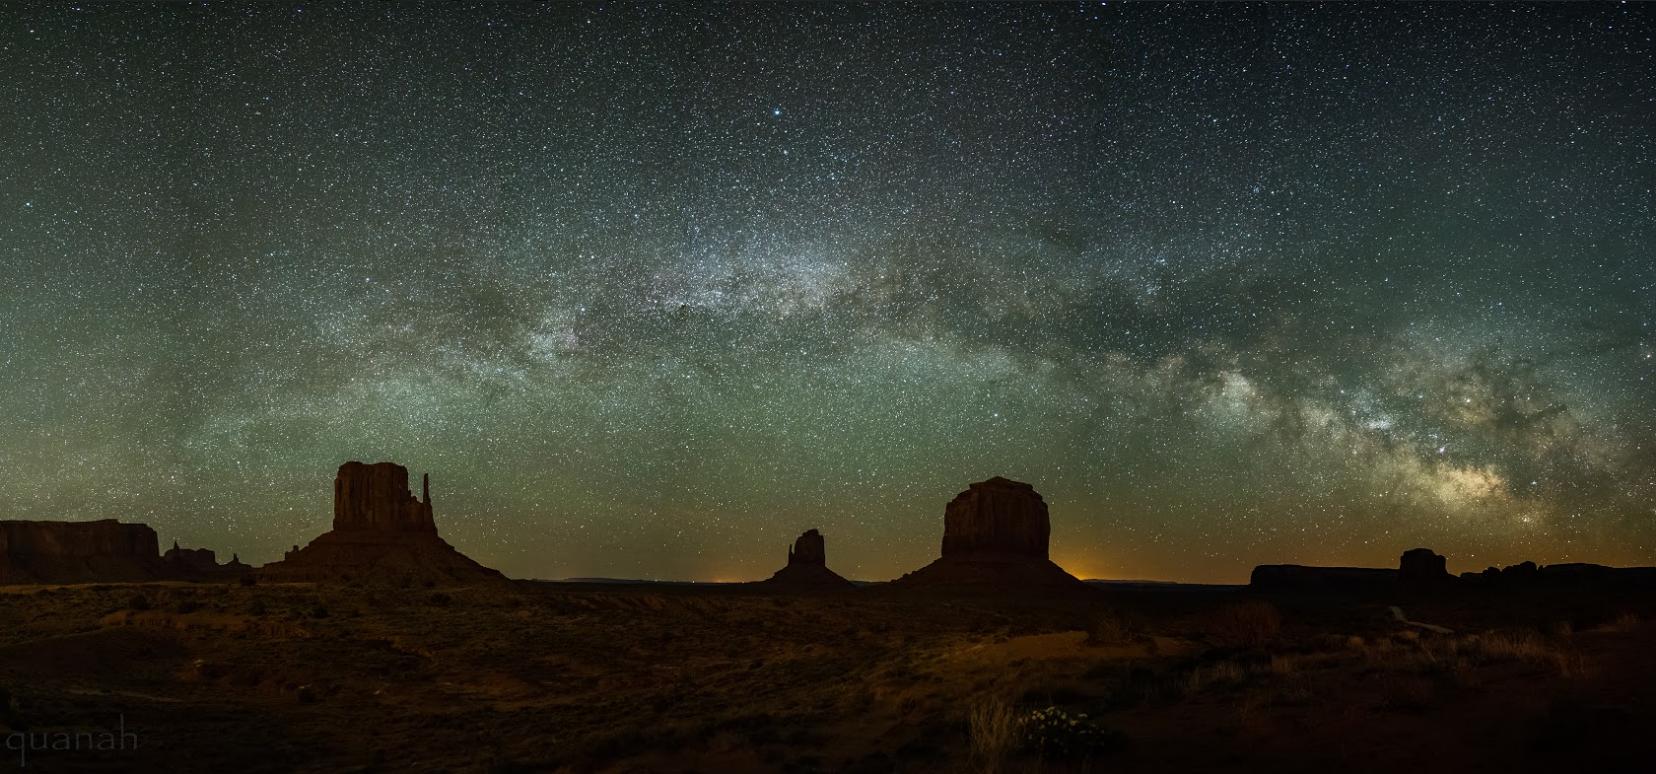 Earth & Sky & Night